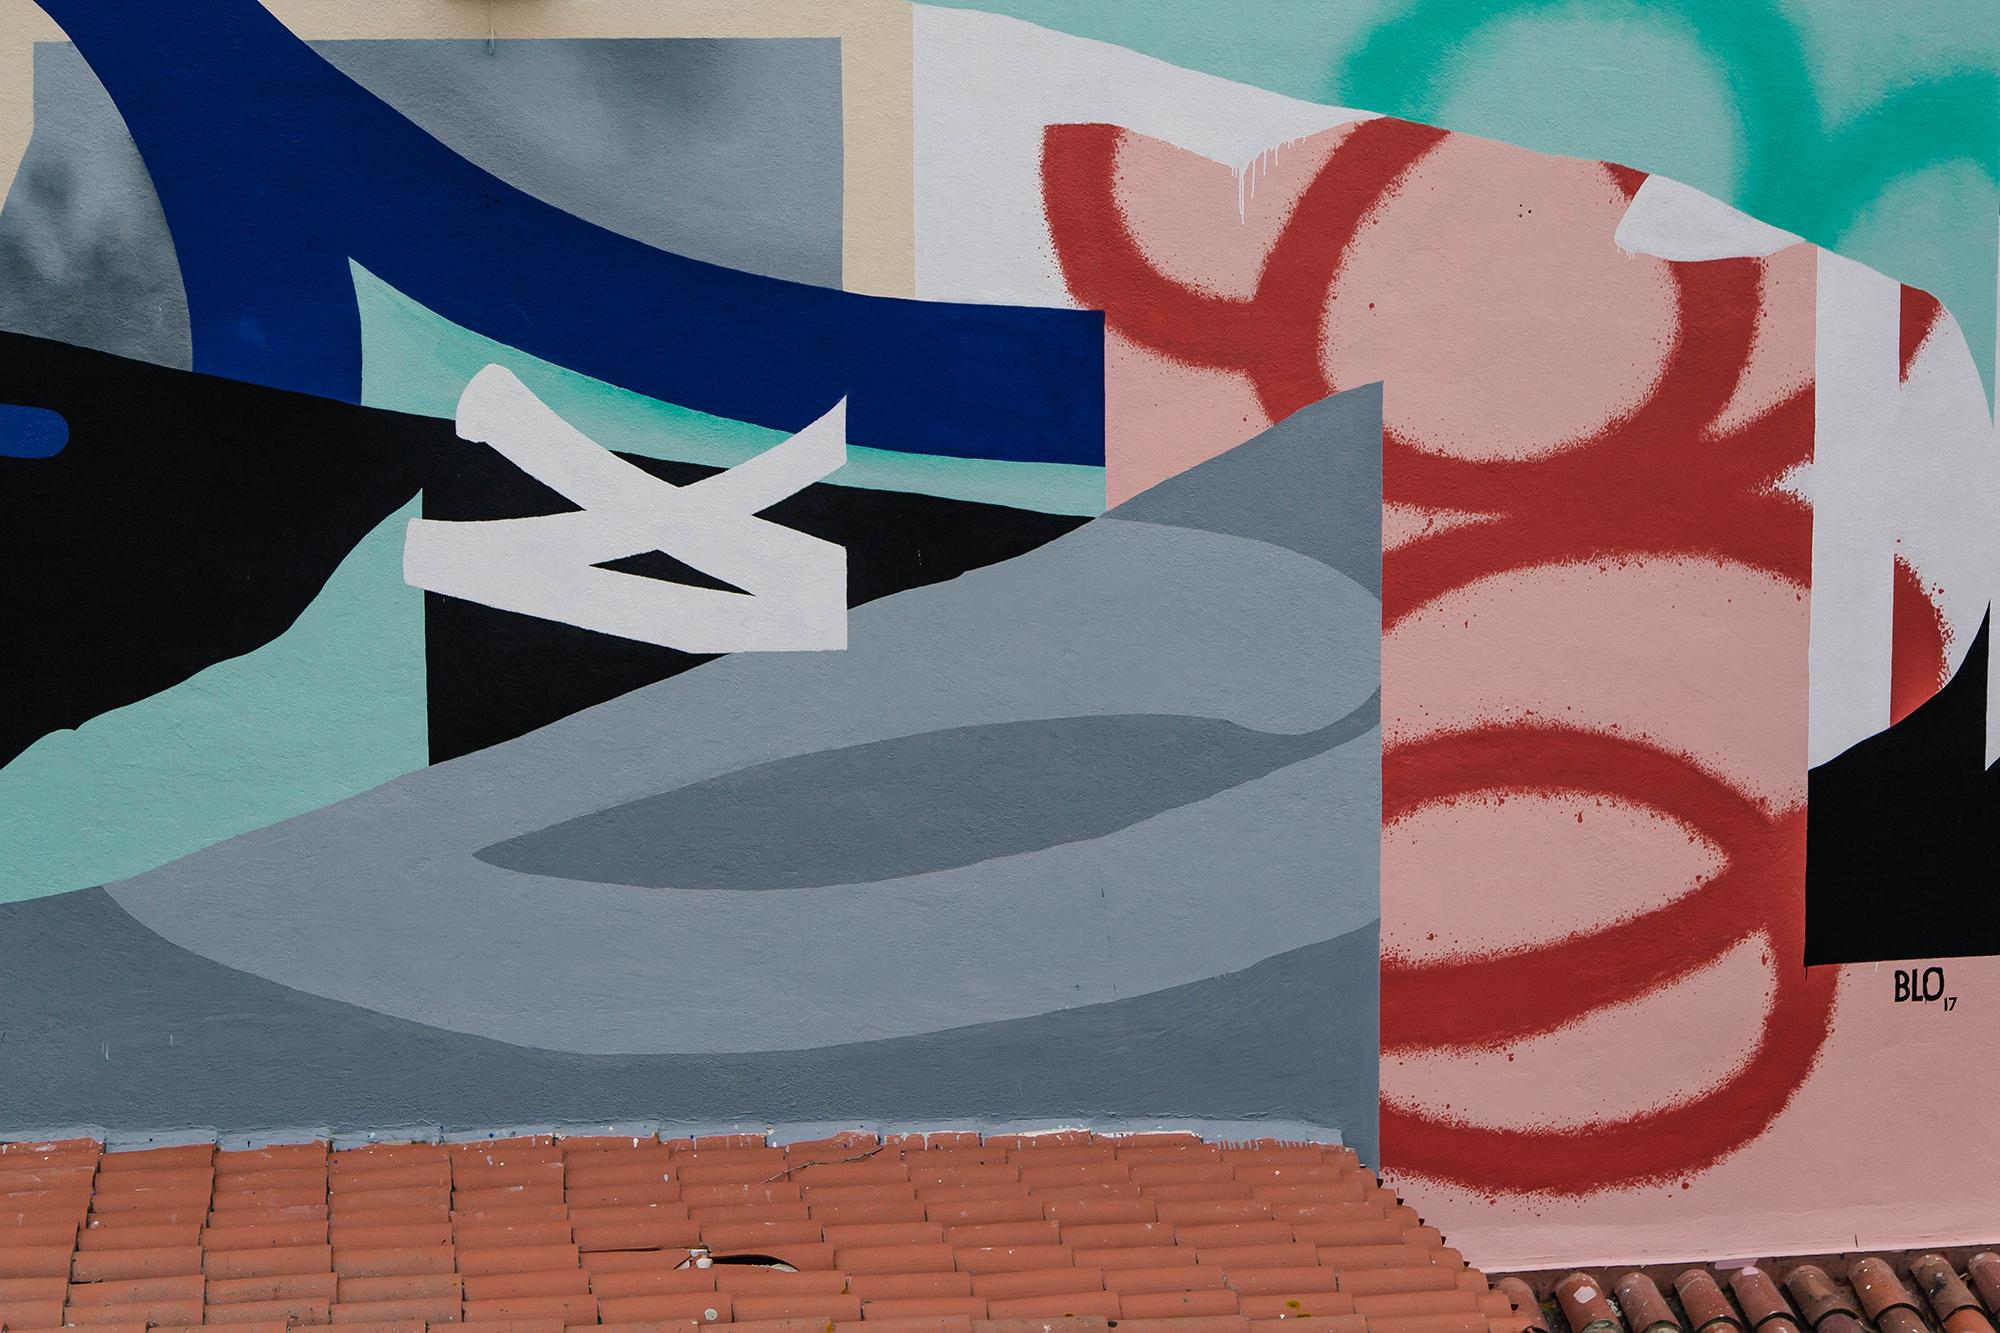 Blo Street Art Perpignan